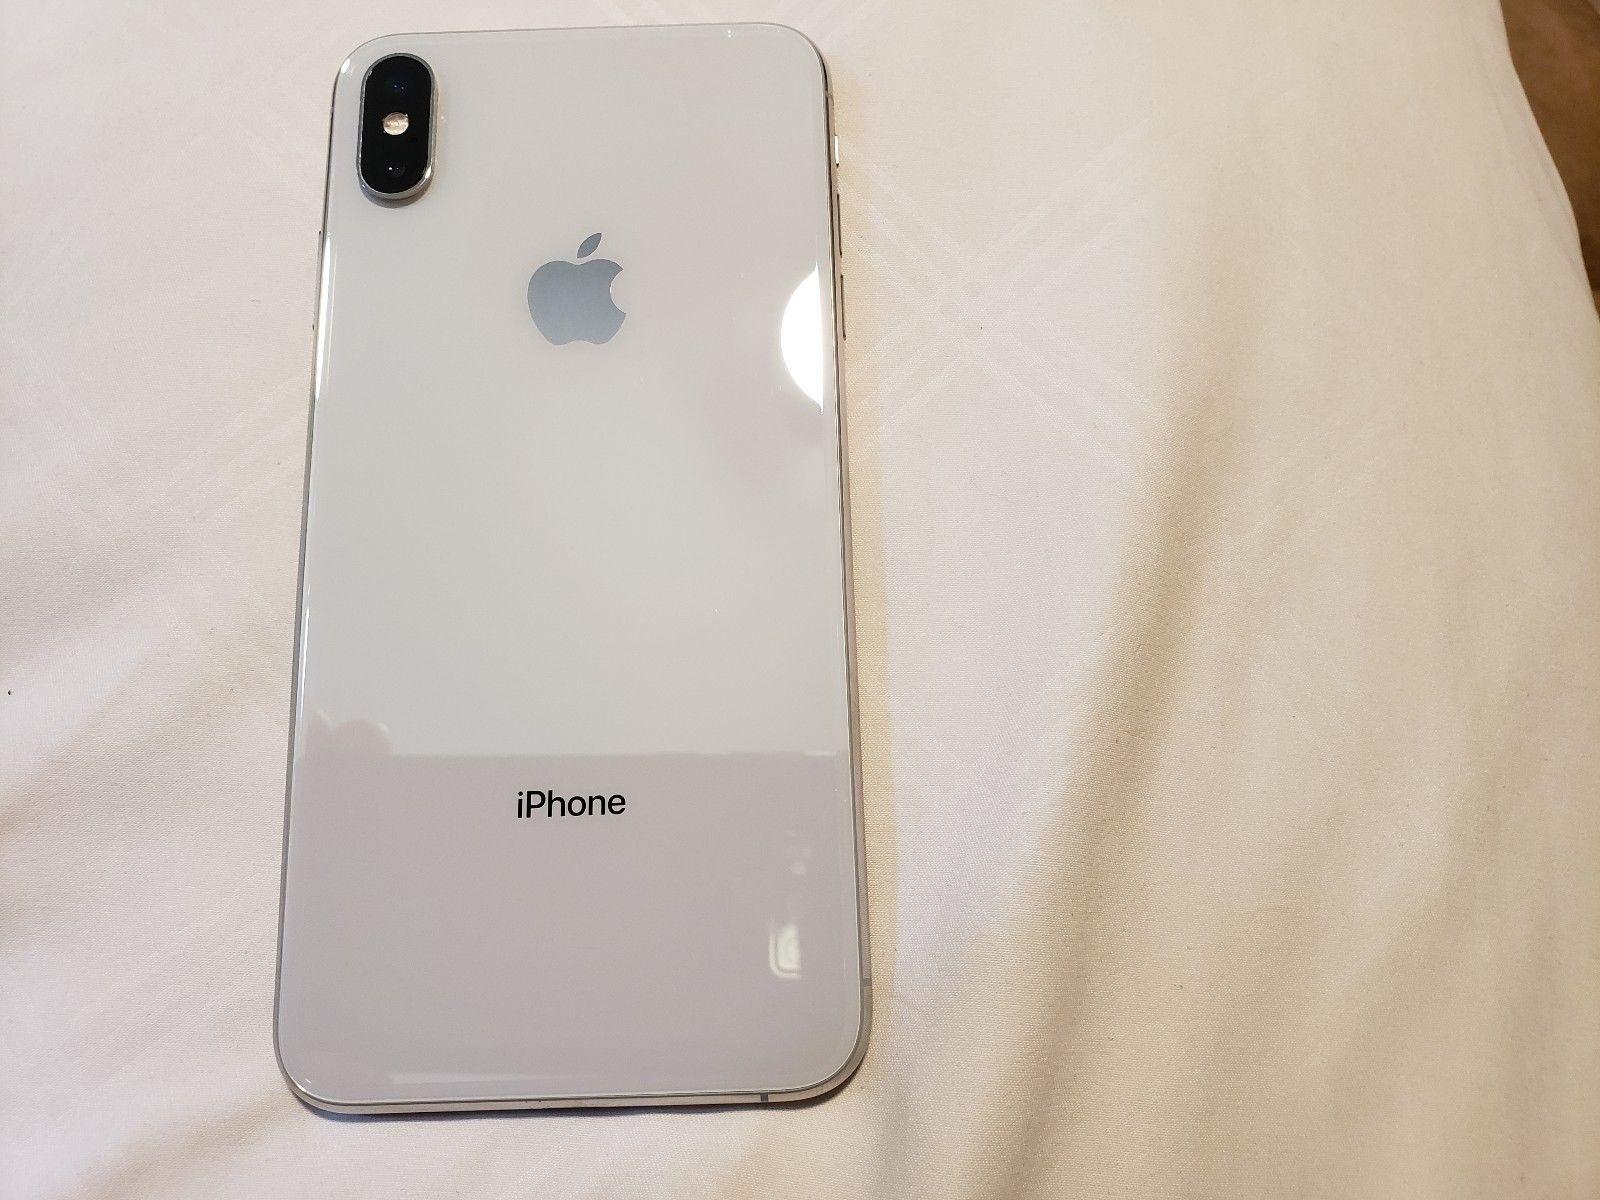 Apple Iphone Xs Max 256gb Silver Unlocked A1921 Cdma Gsm Apple Iphone Iphone Iphone Price